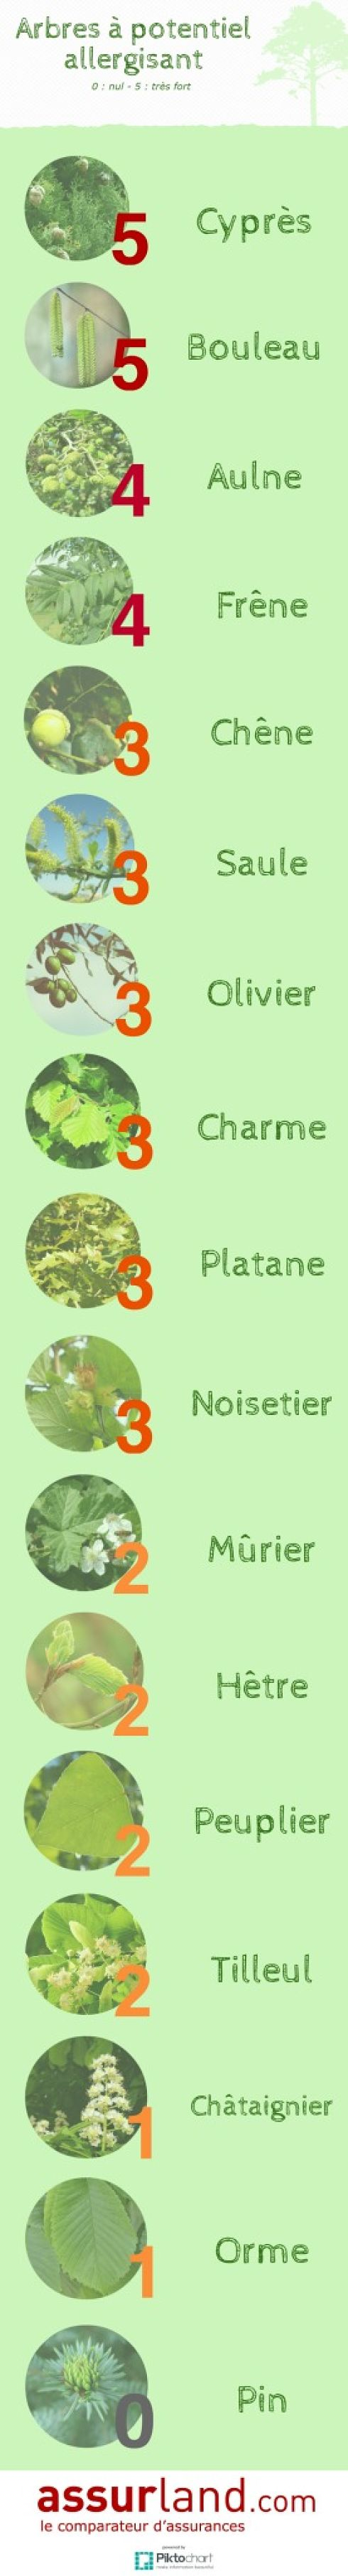 Infographie-arbres-potentiel-allergisant